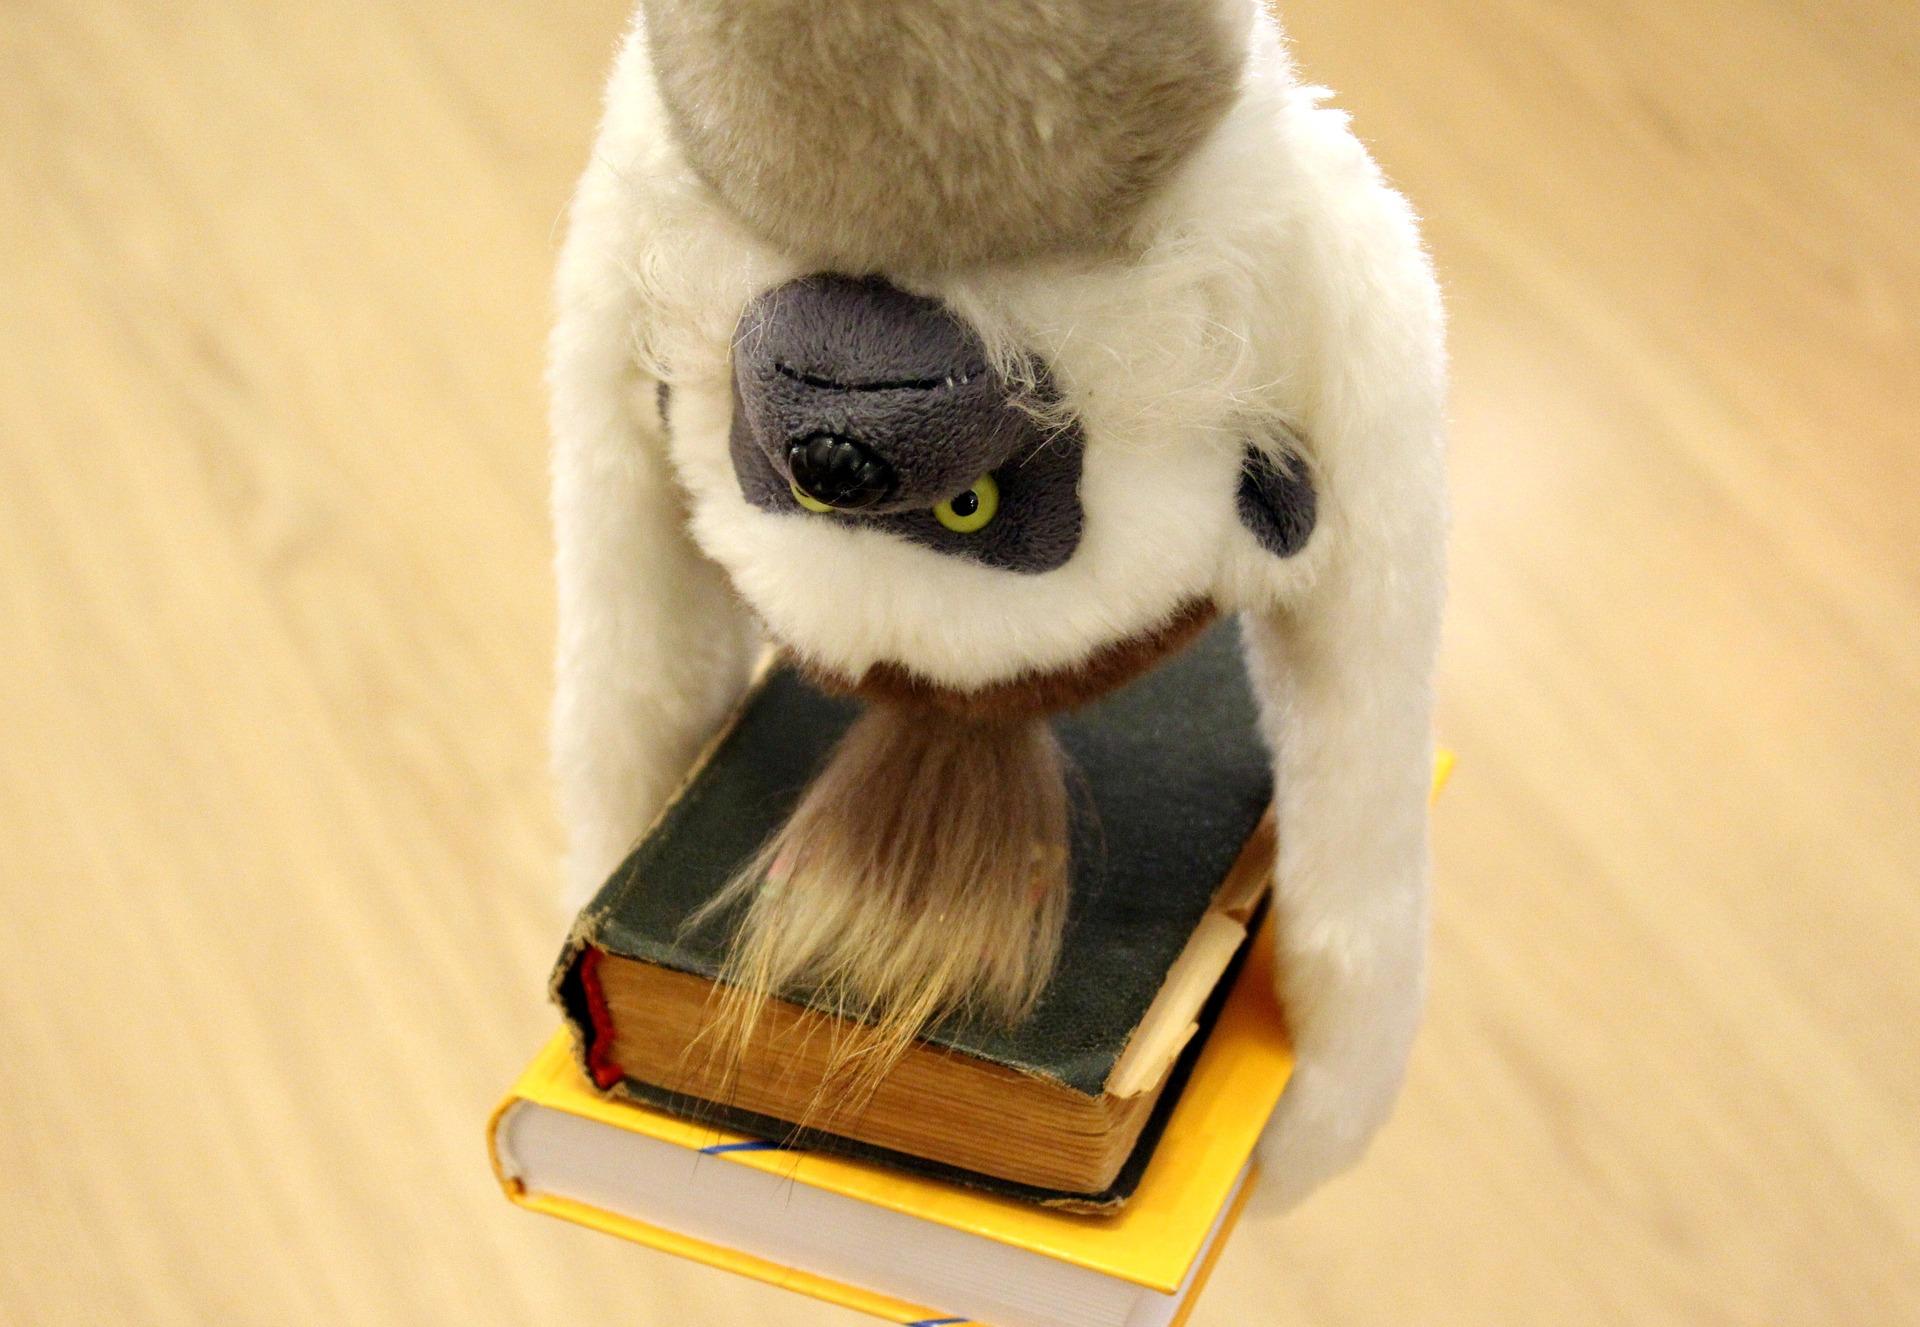 11 2018 monkey & books